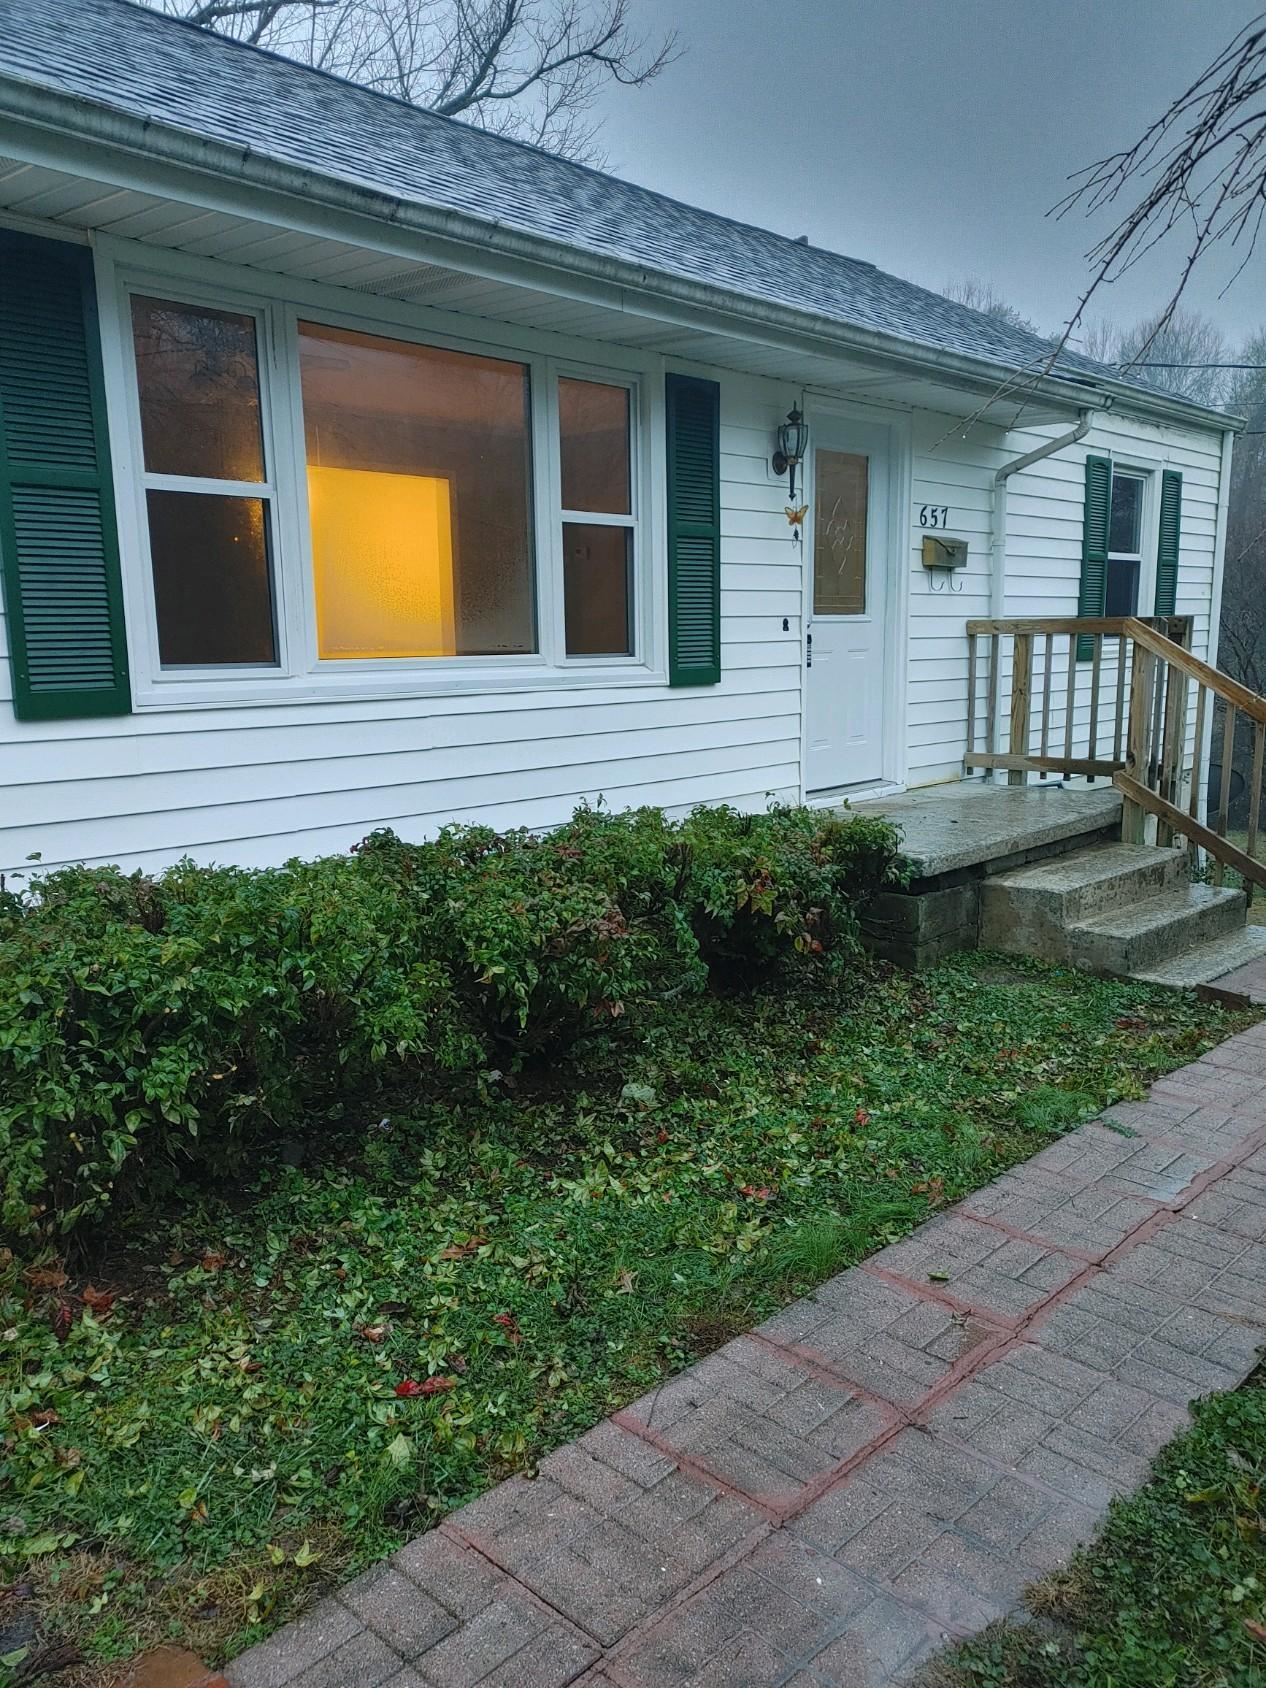 Photo of 657 Robertsville Rd, Oak Ridge, TN 37830 (MLS # 1138910)